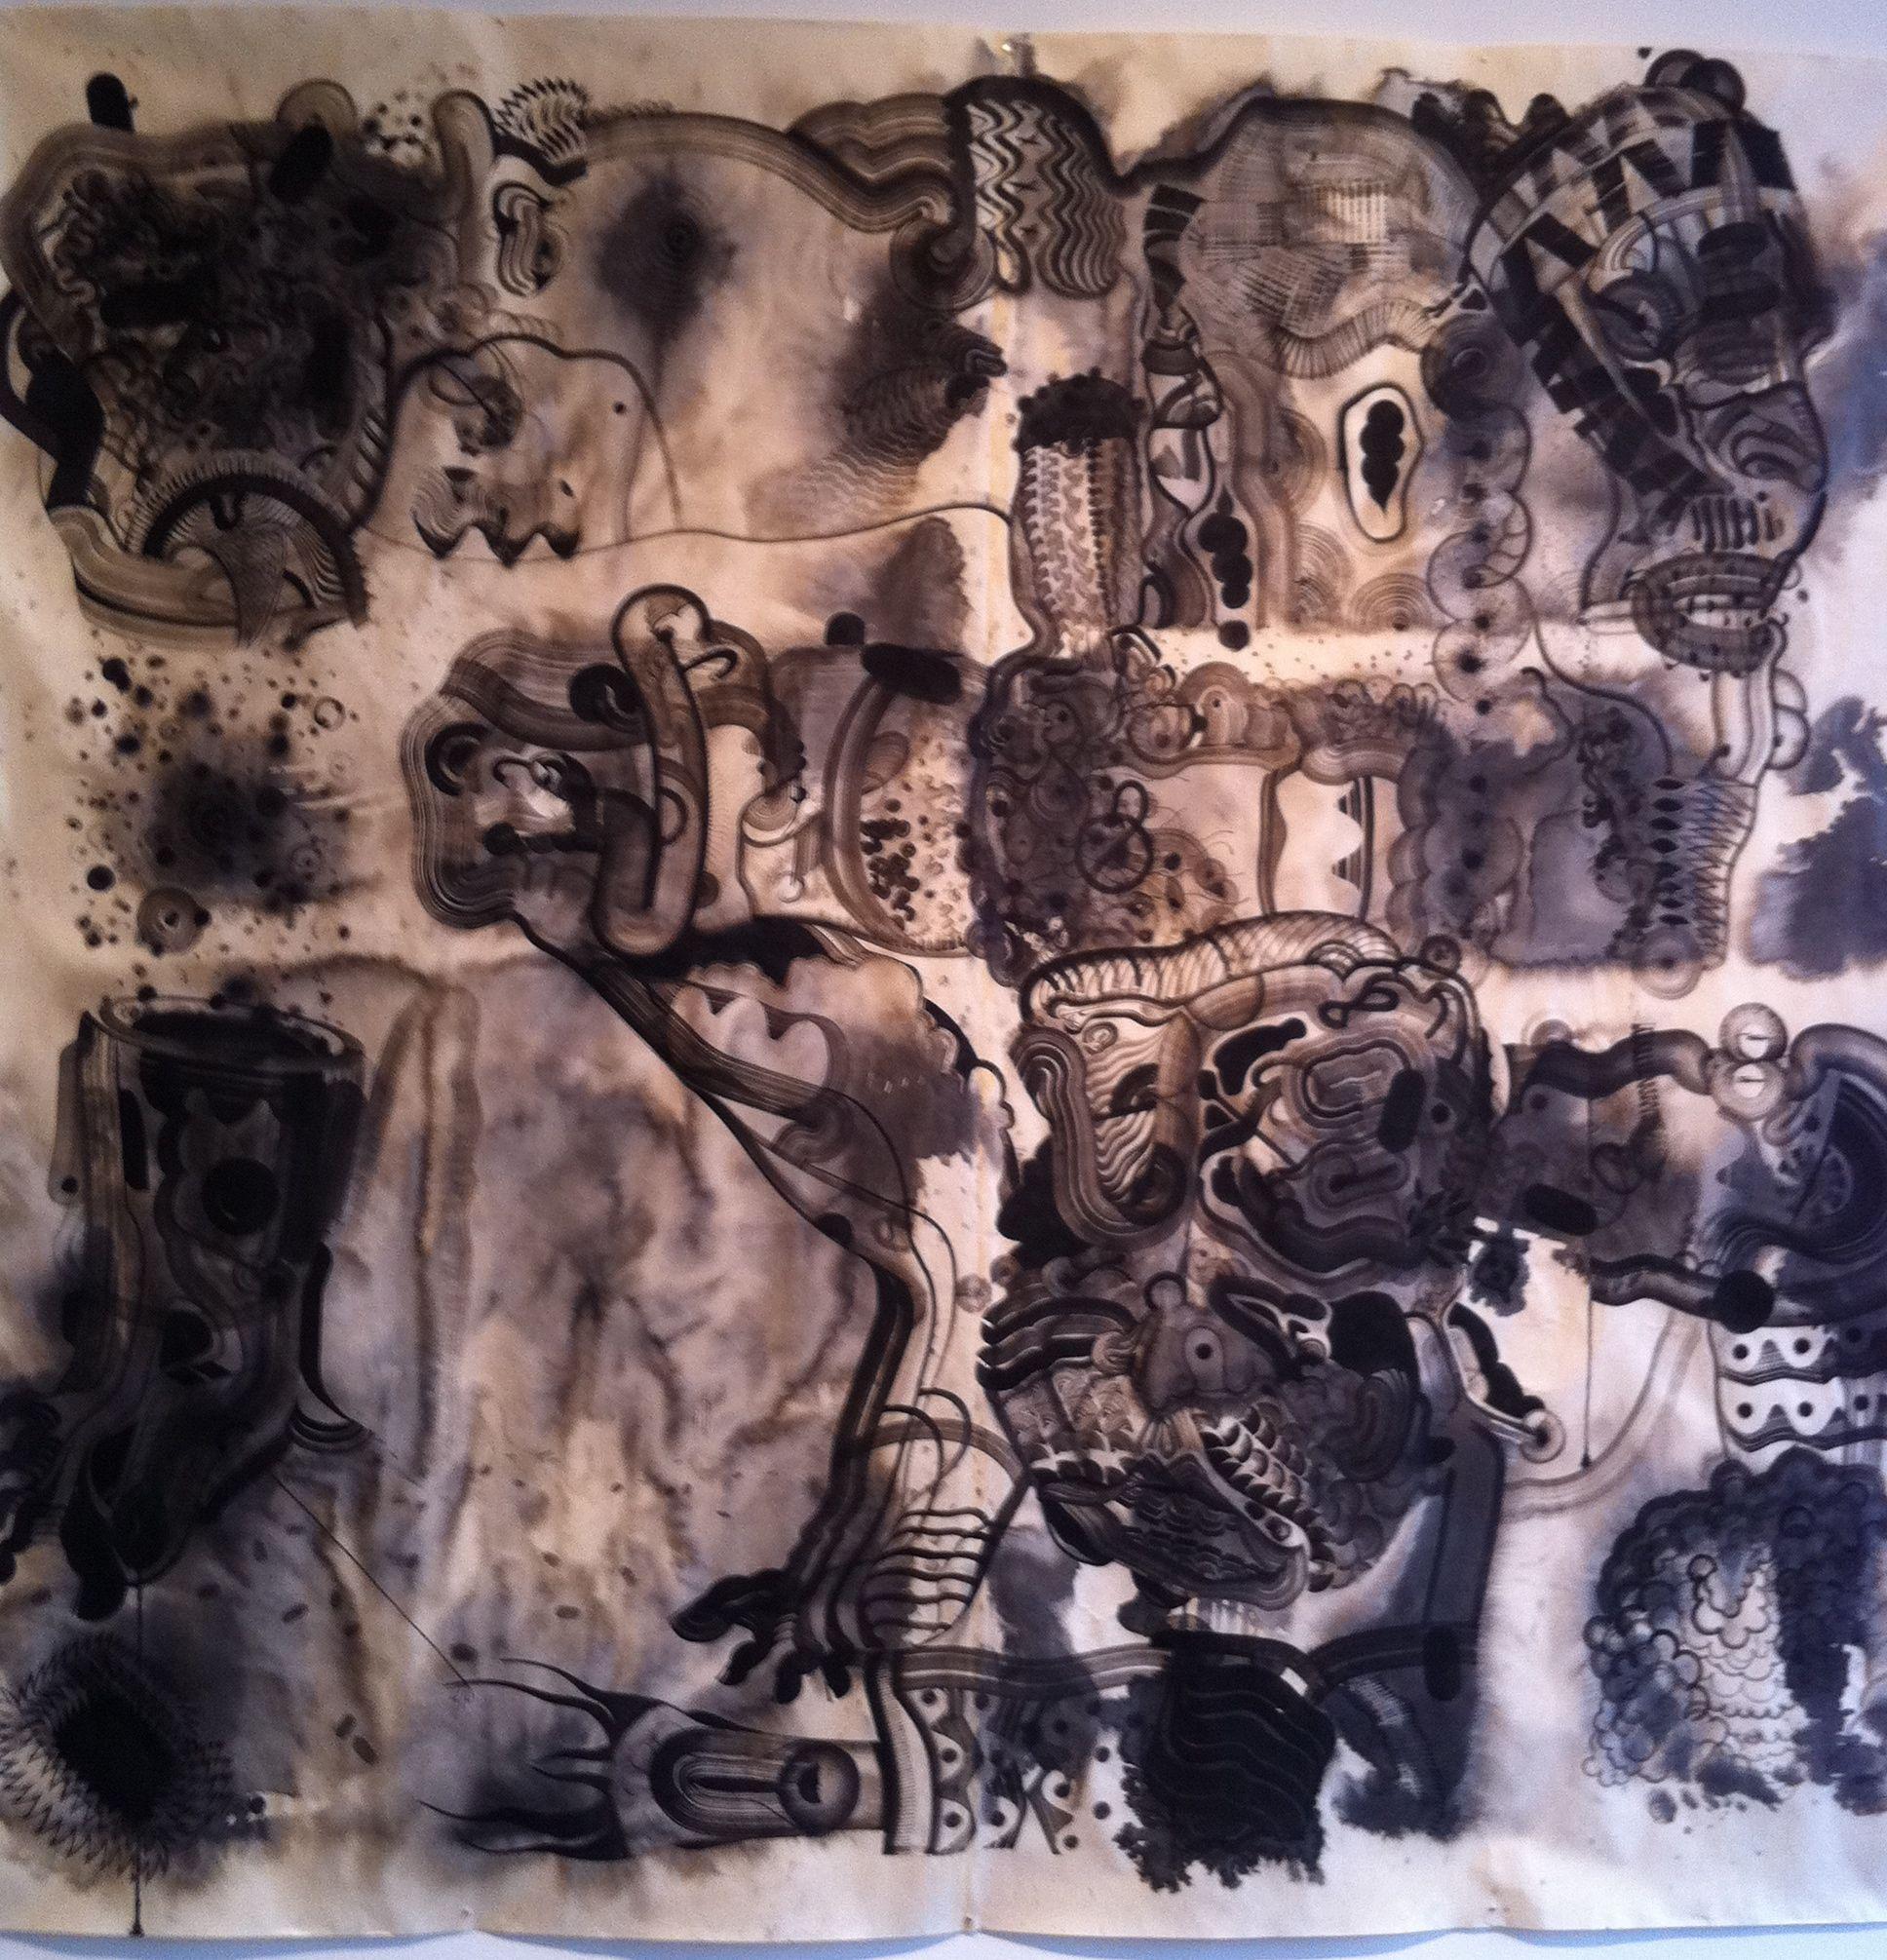 Robert Hardgrave 10'x 10' ink drawing, 2011 (?)